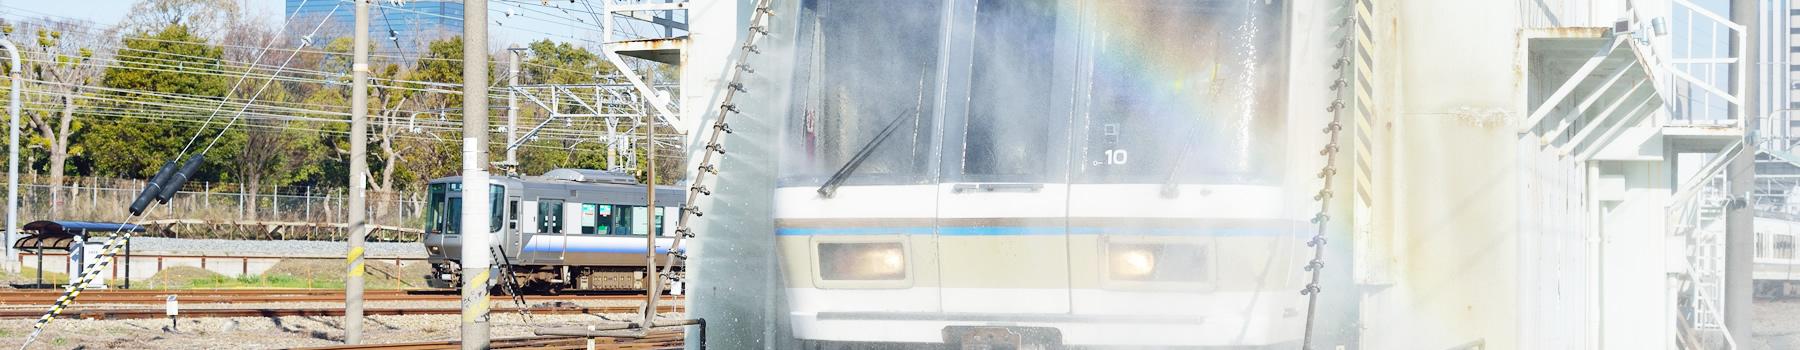 railway_title_bg1